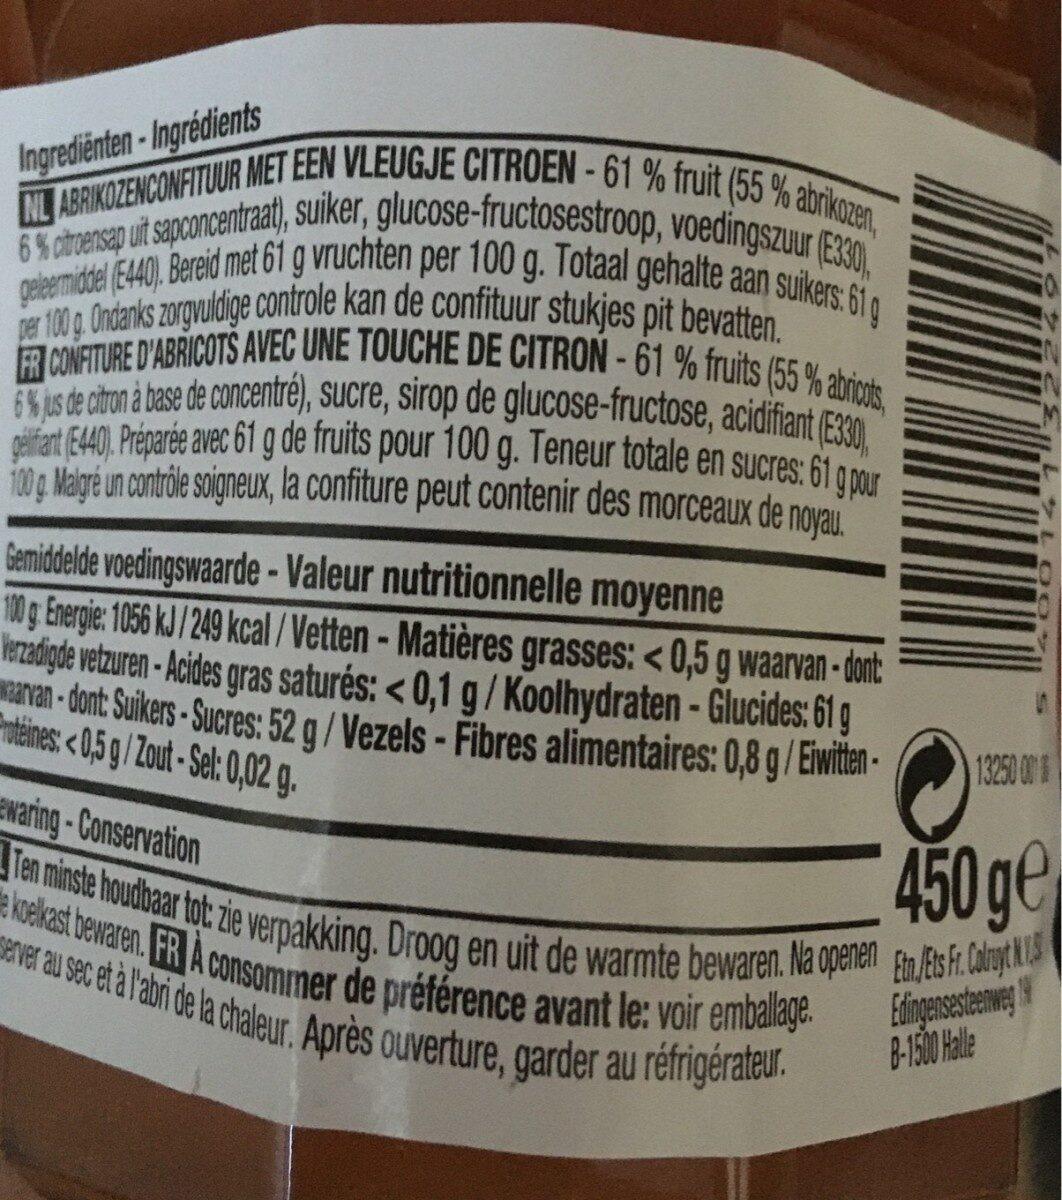 Confiture abricot - Voedingswaarden - fr